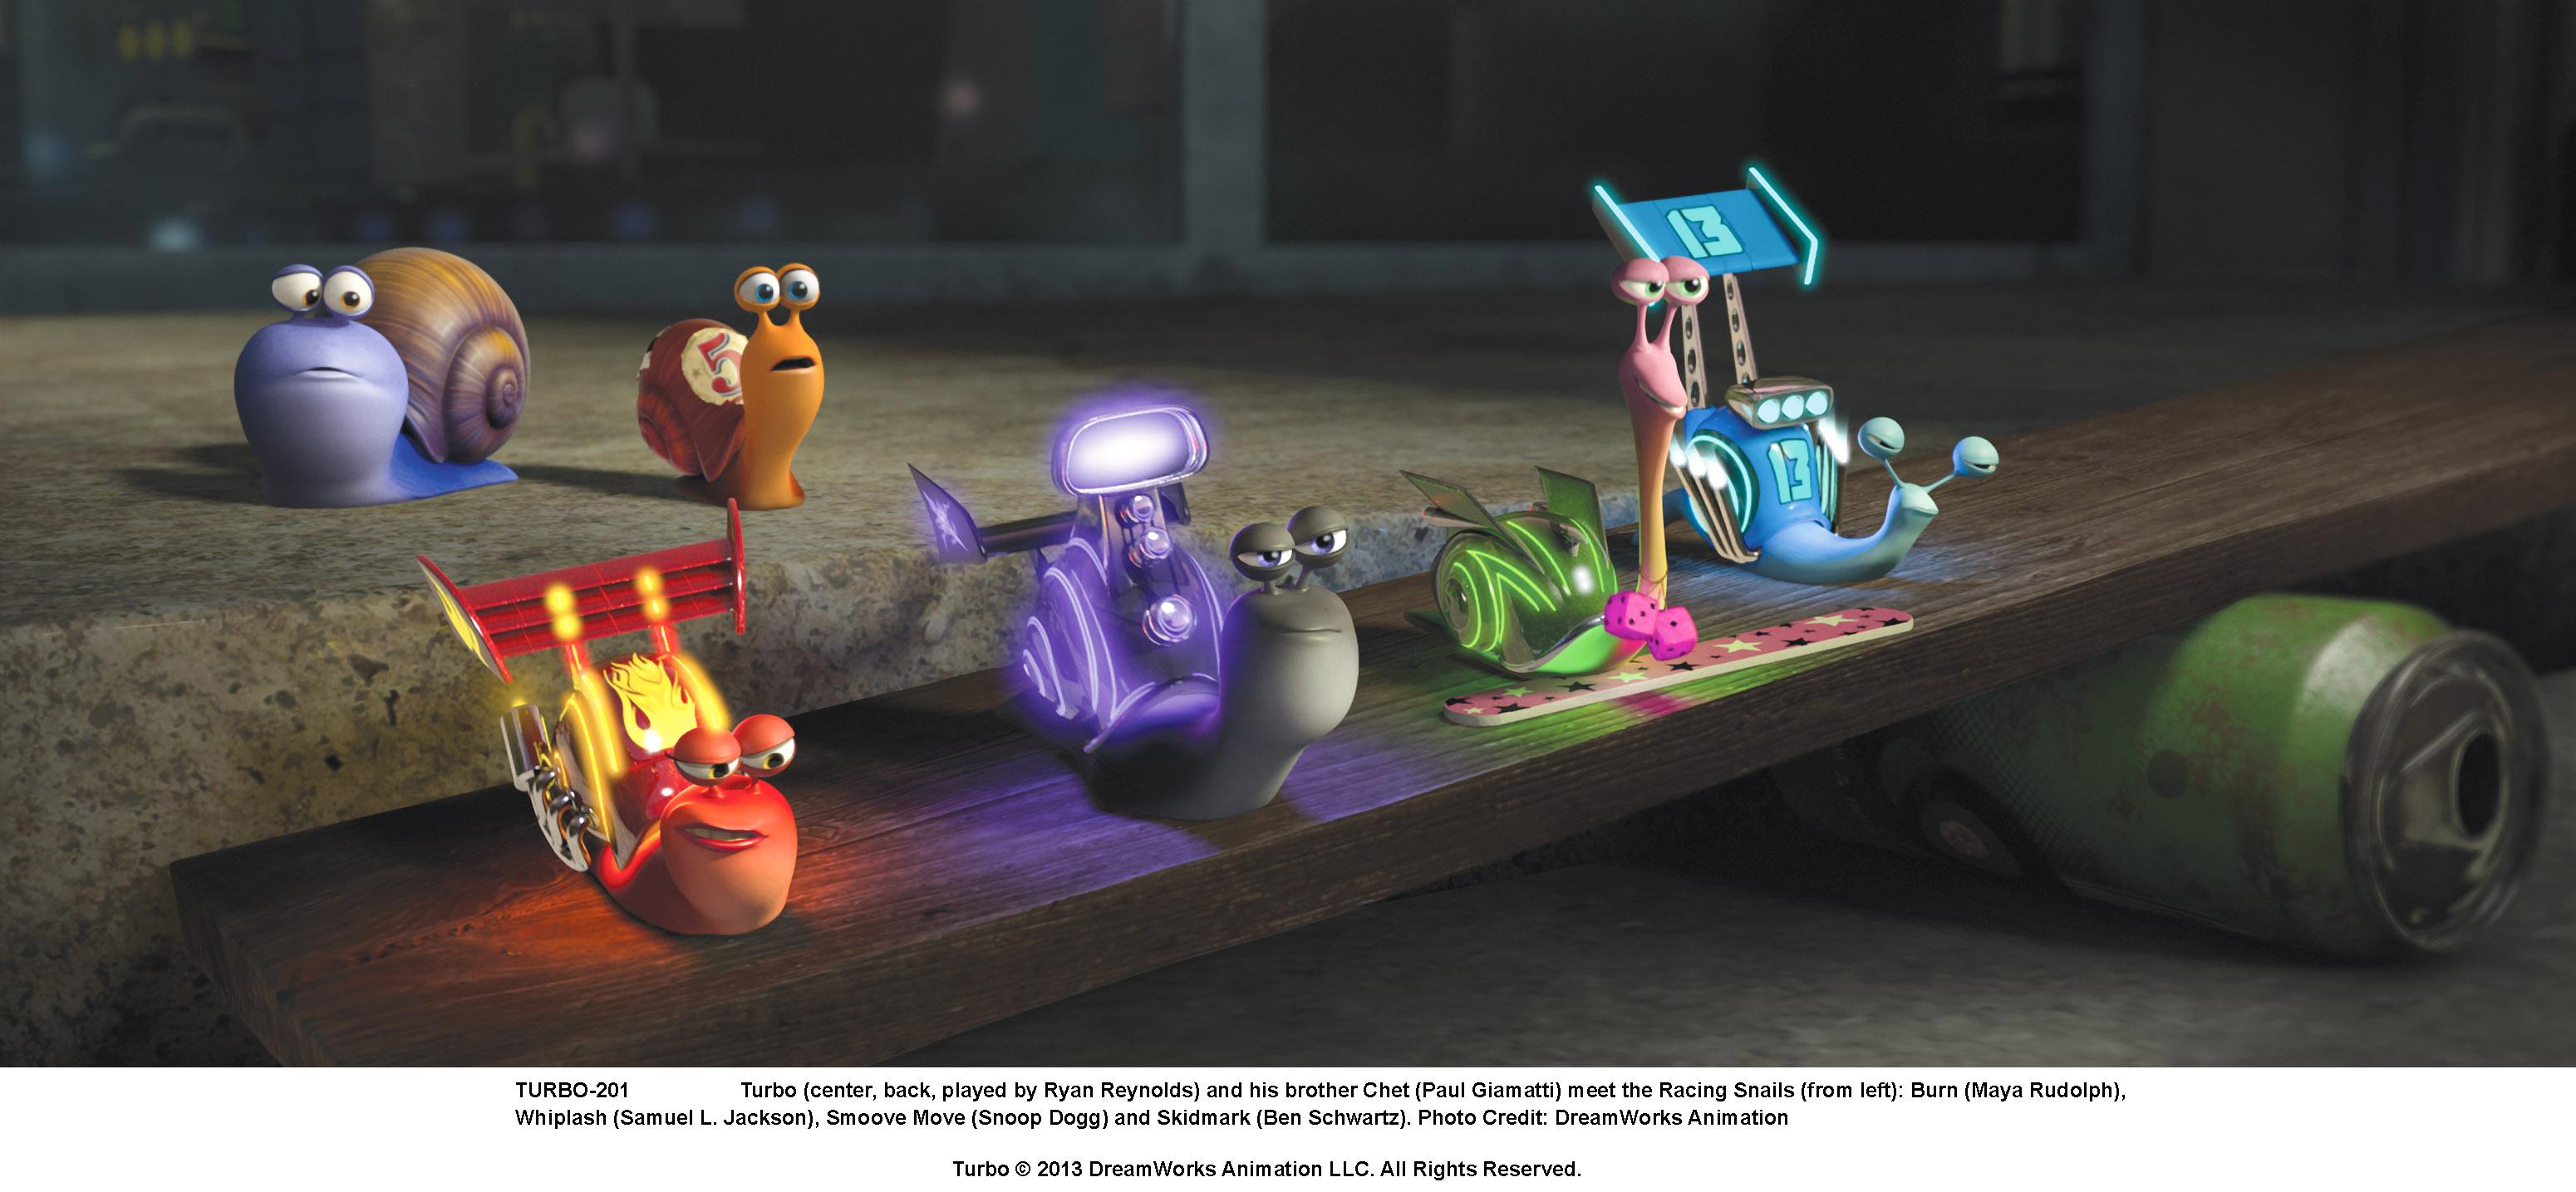 turbo-movie-turbo-and-chett-watch-the-racing-snails.jpg